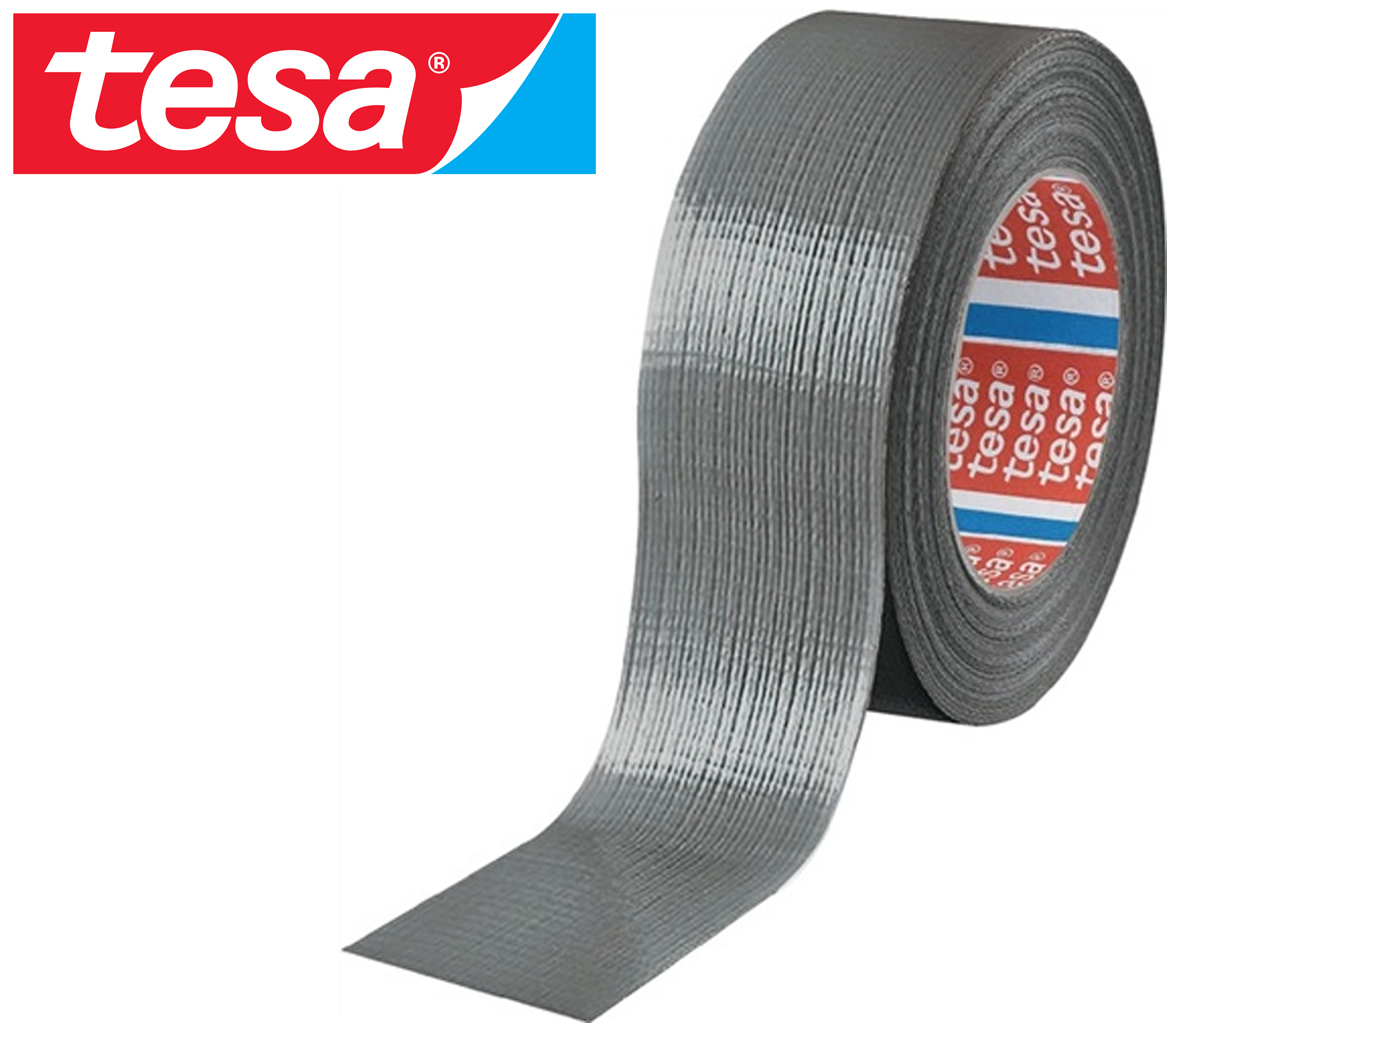 tape tesa 4662 PE gecoat | DKMTools - DKM Tools